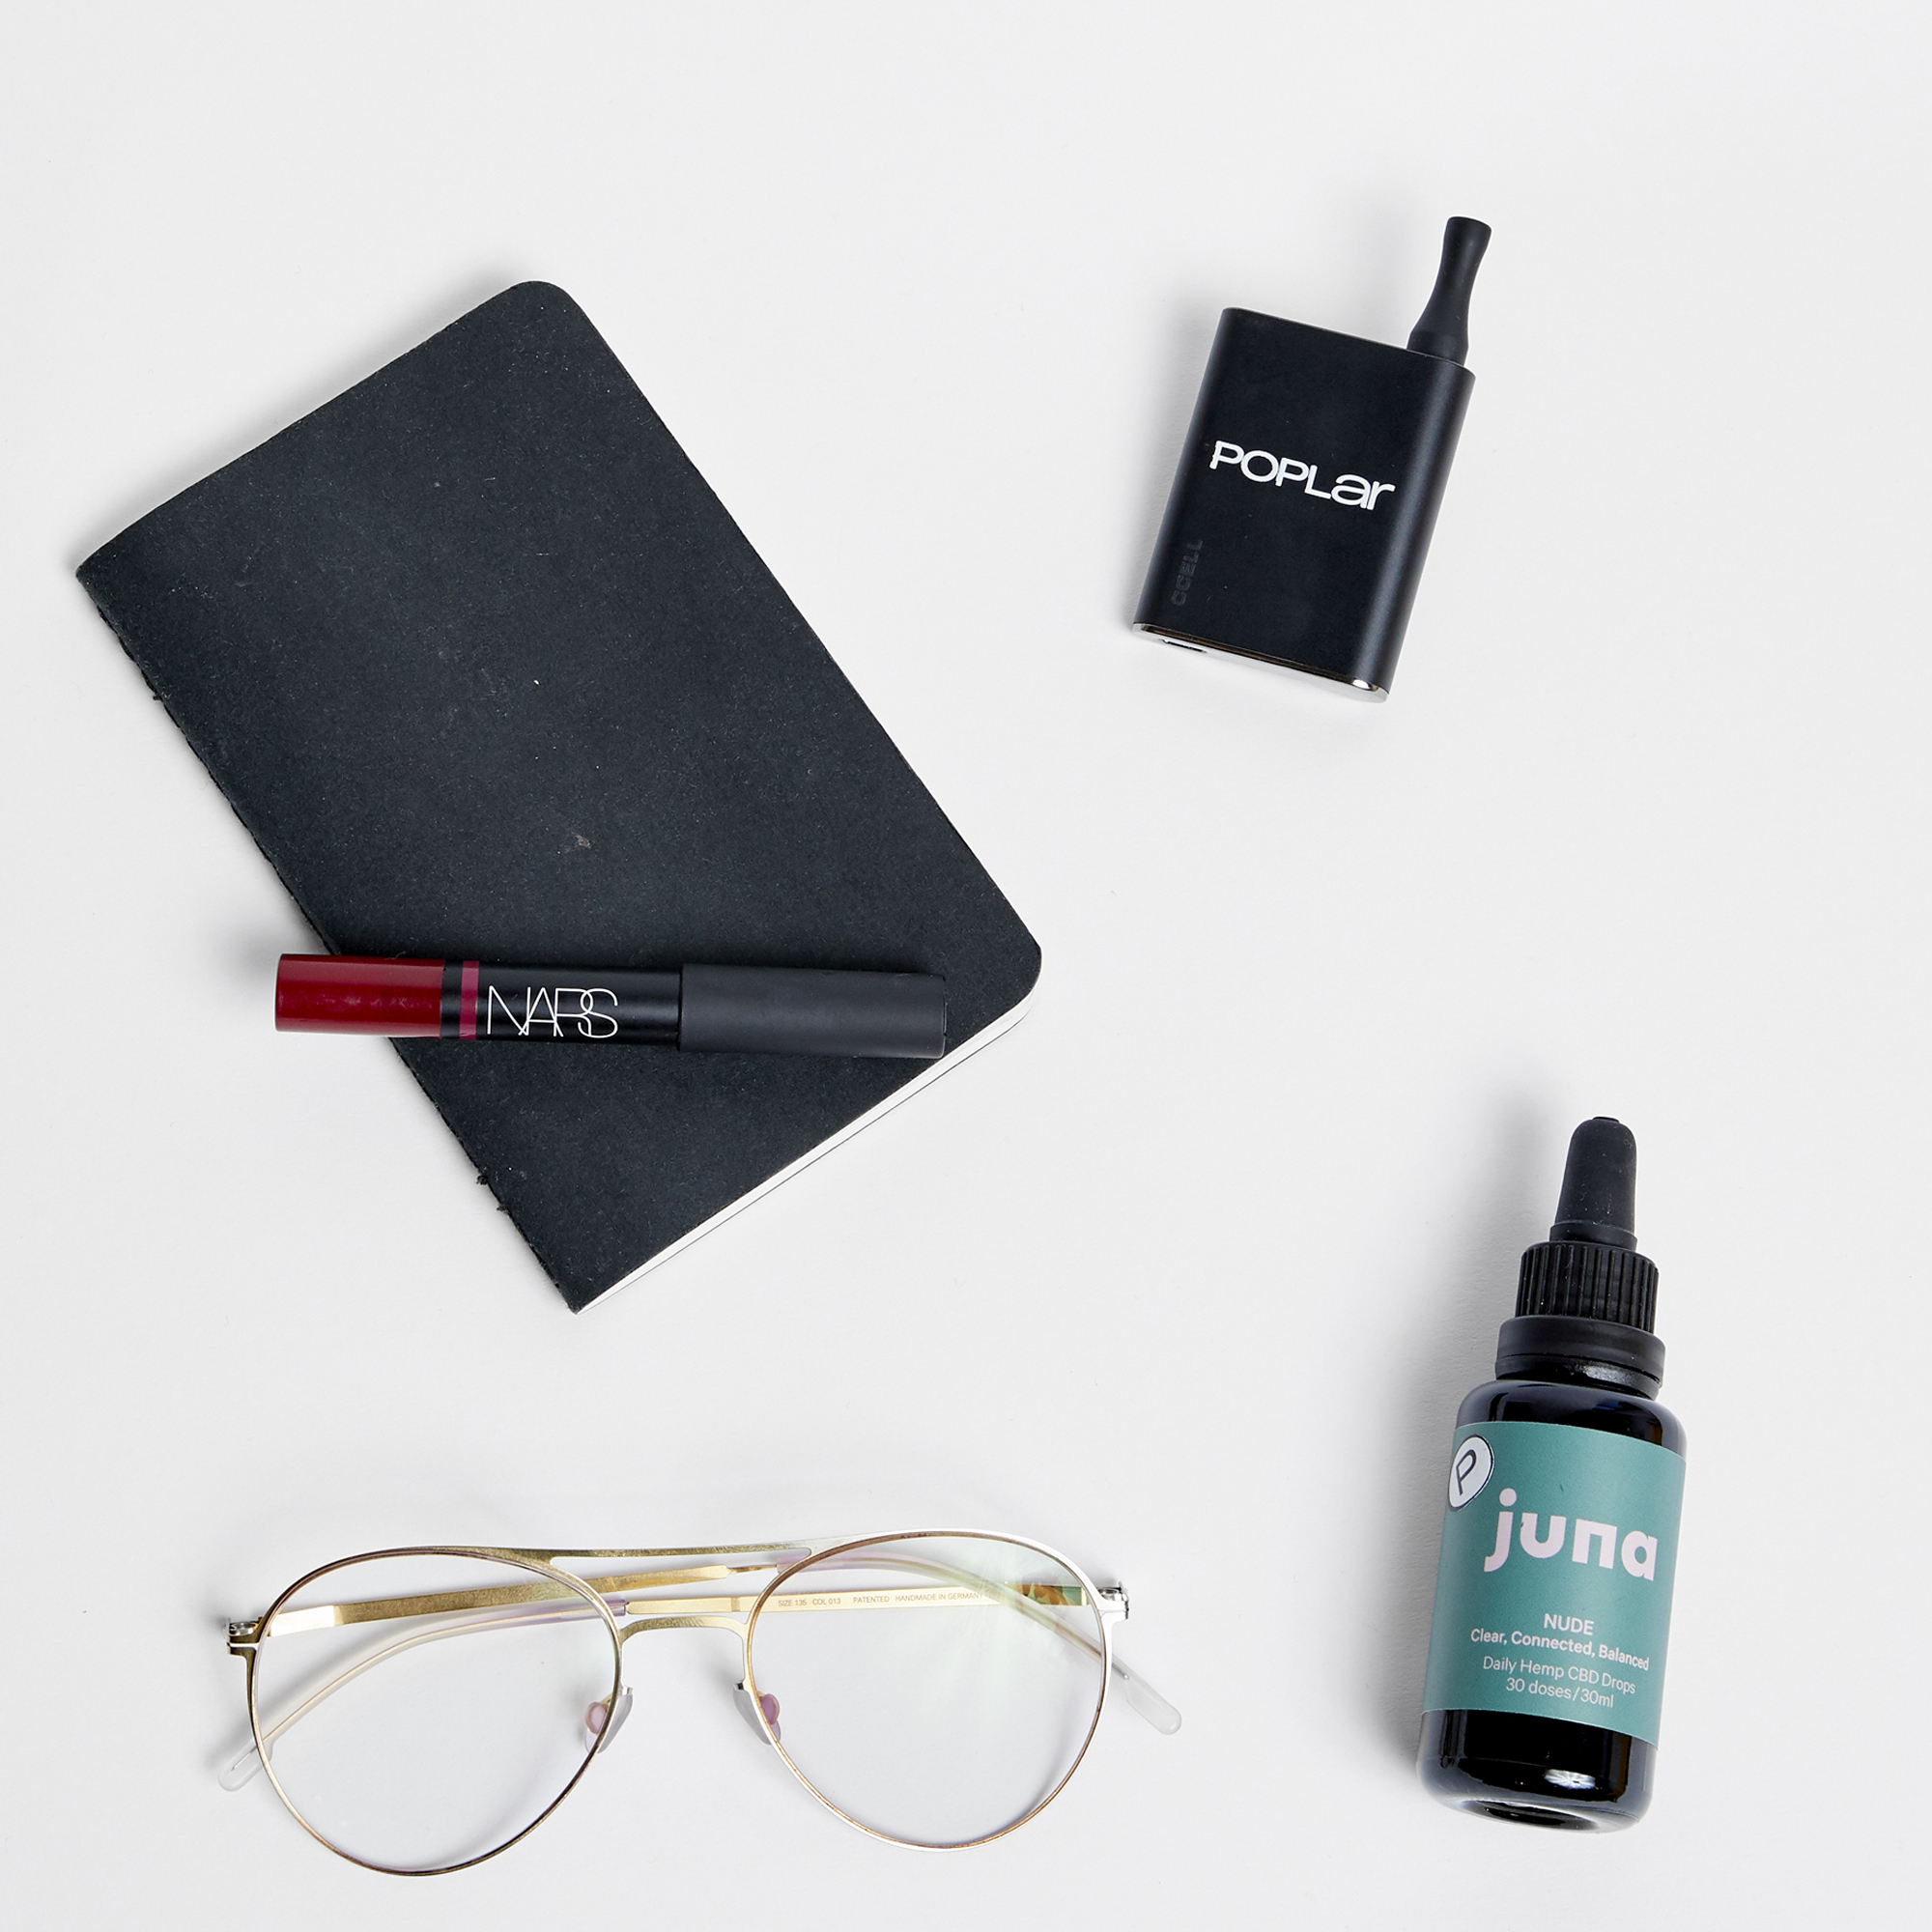 desk items